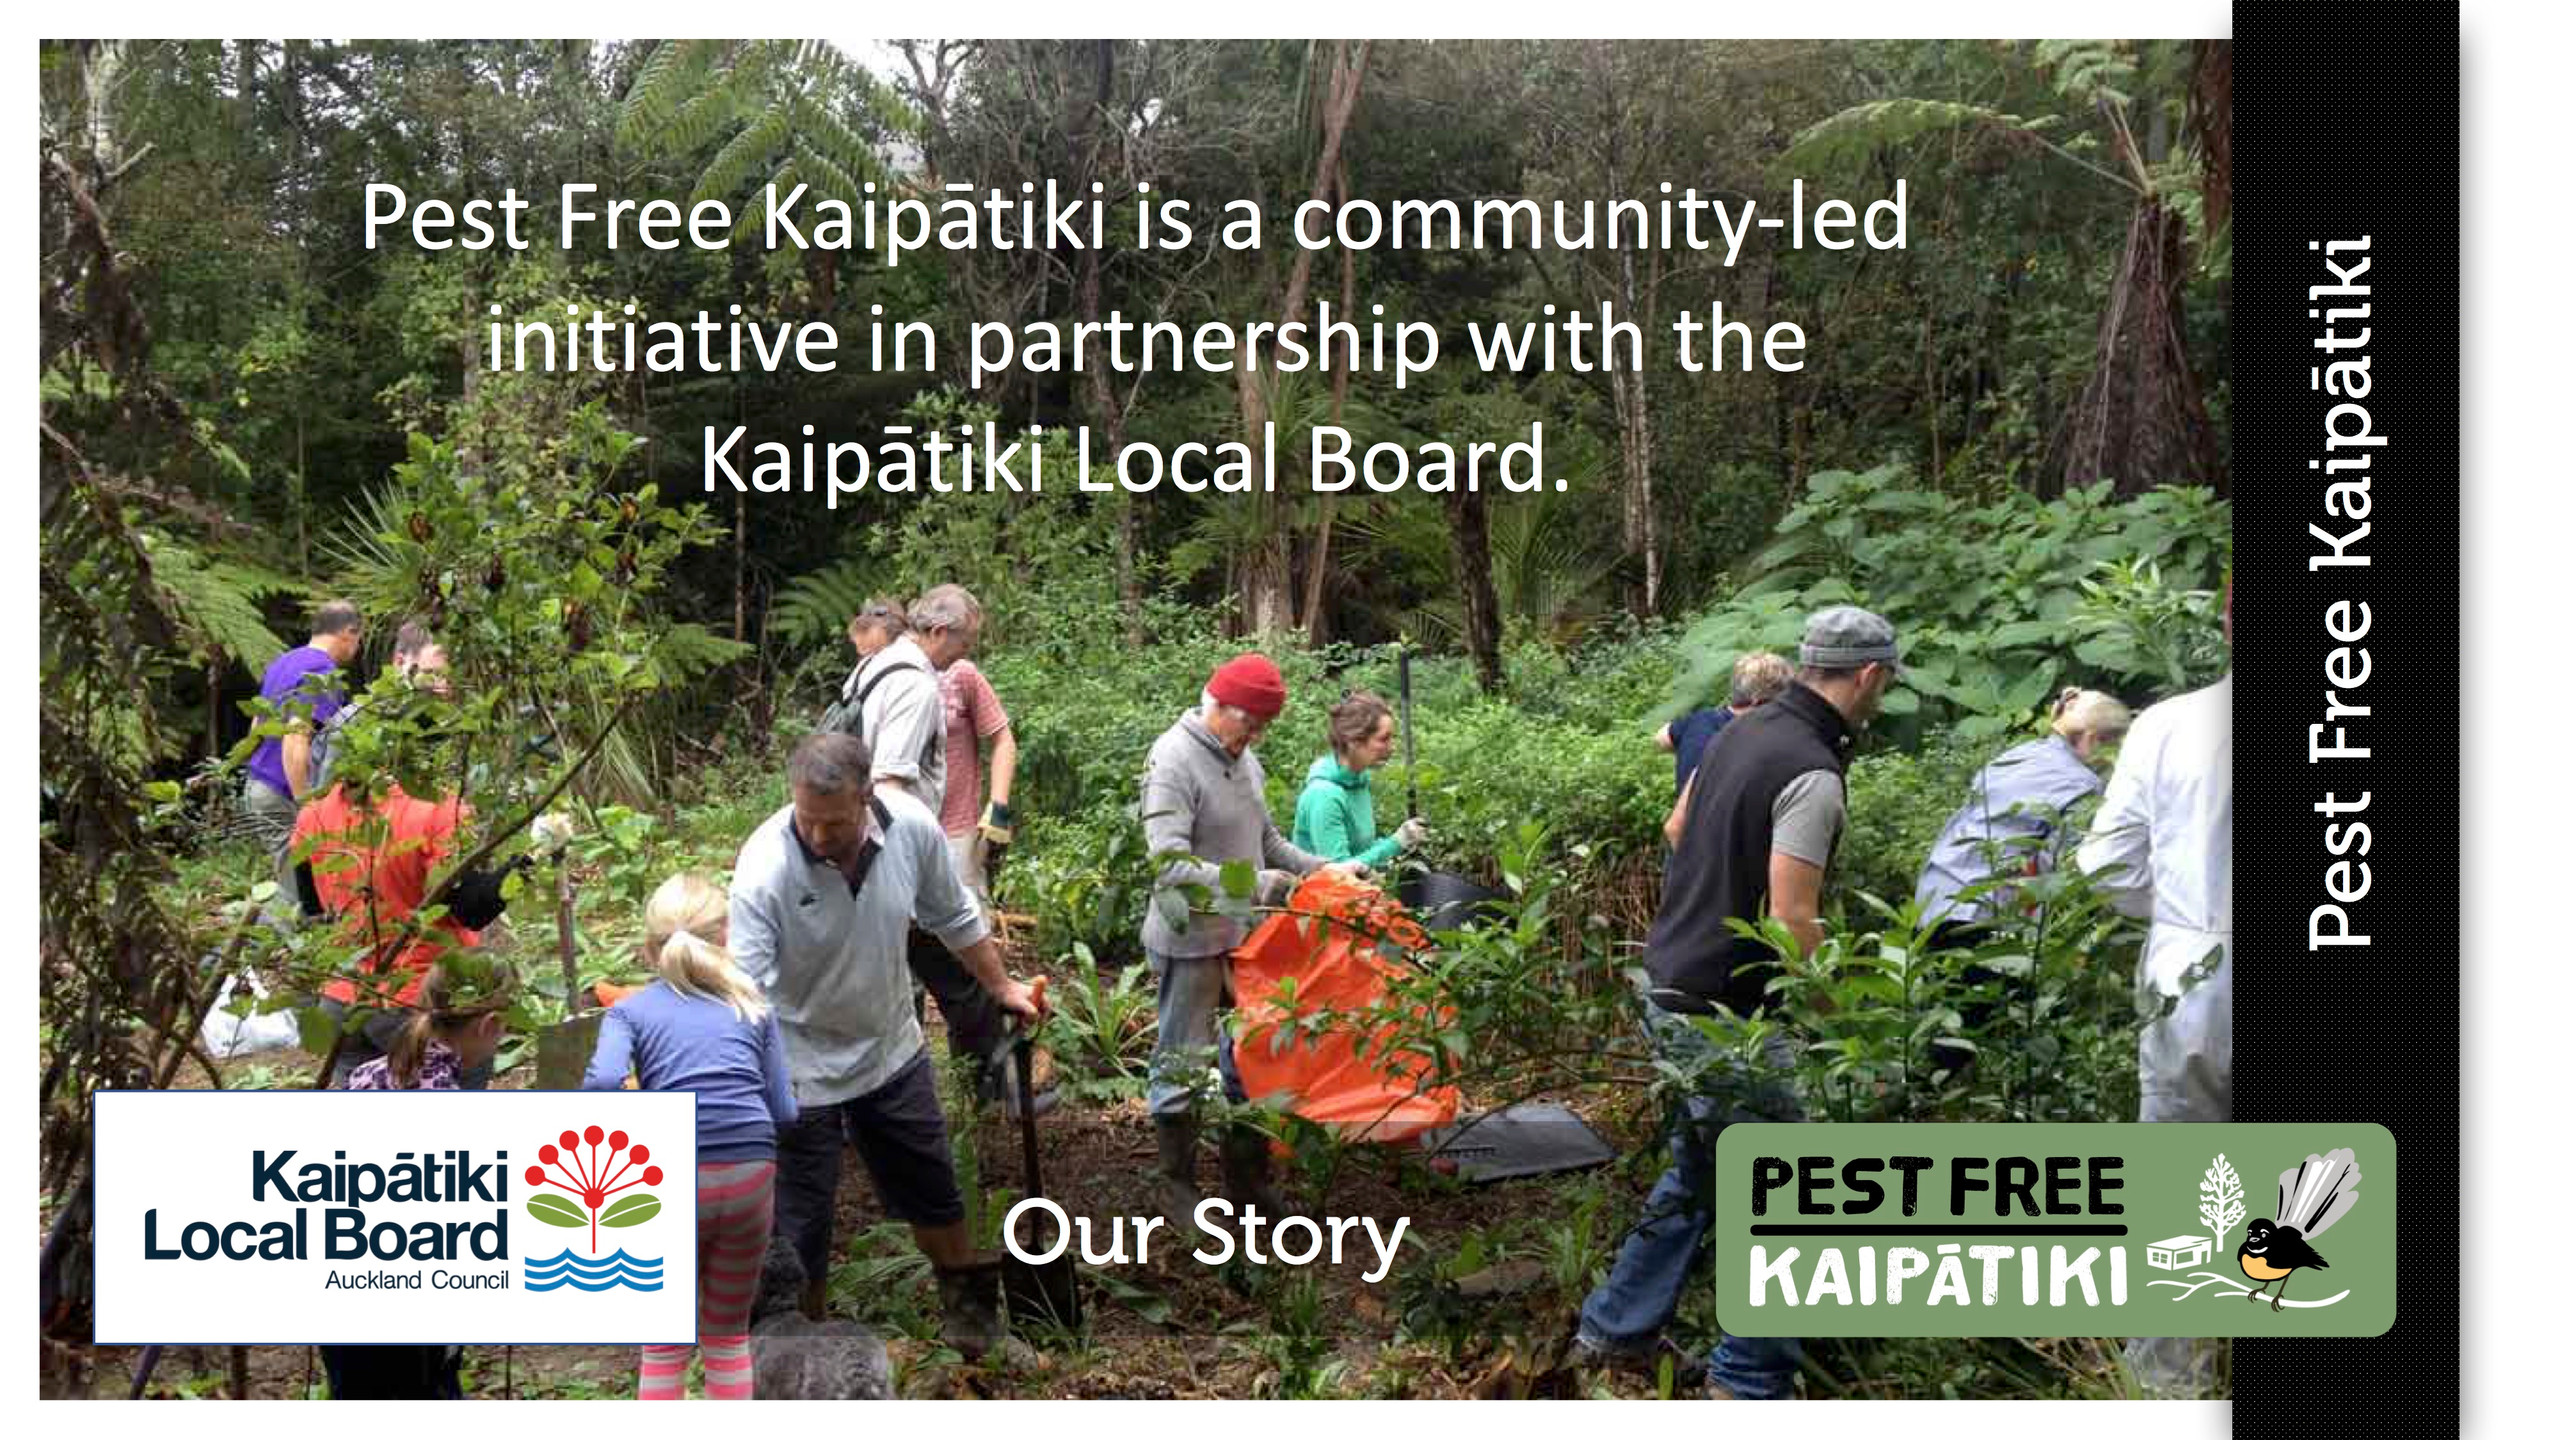 Pest Free Kaipatiki-Pestival-slide2